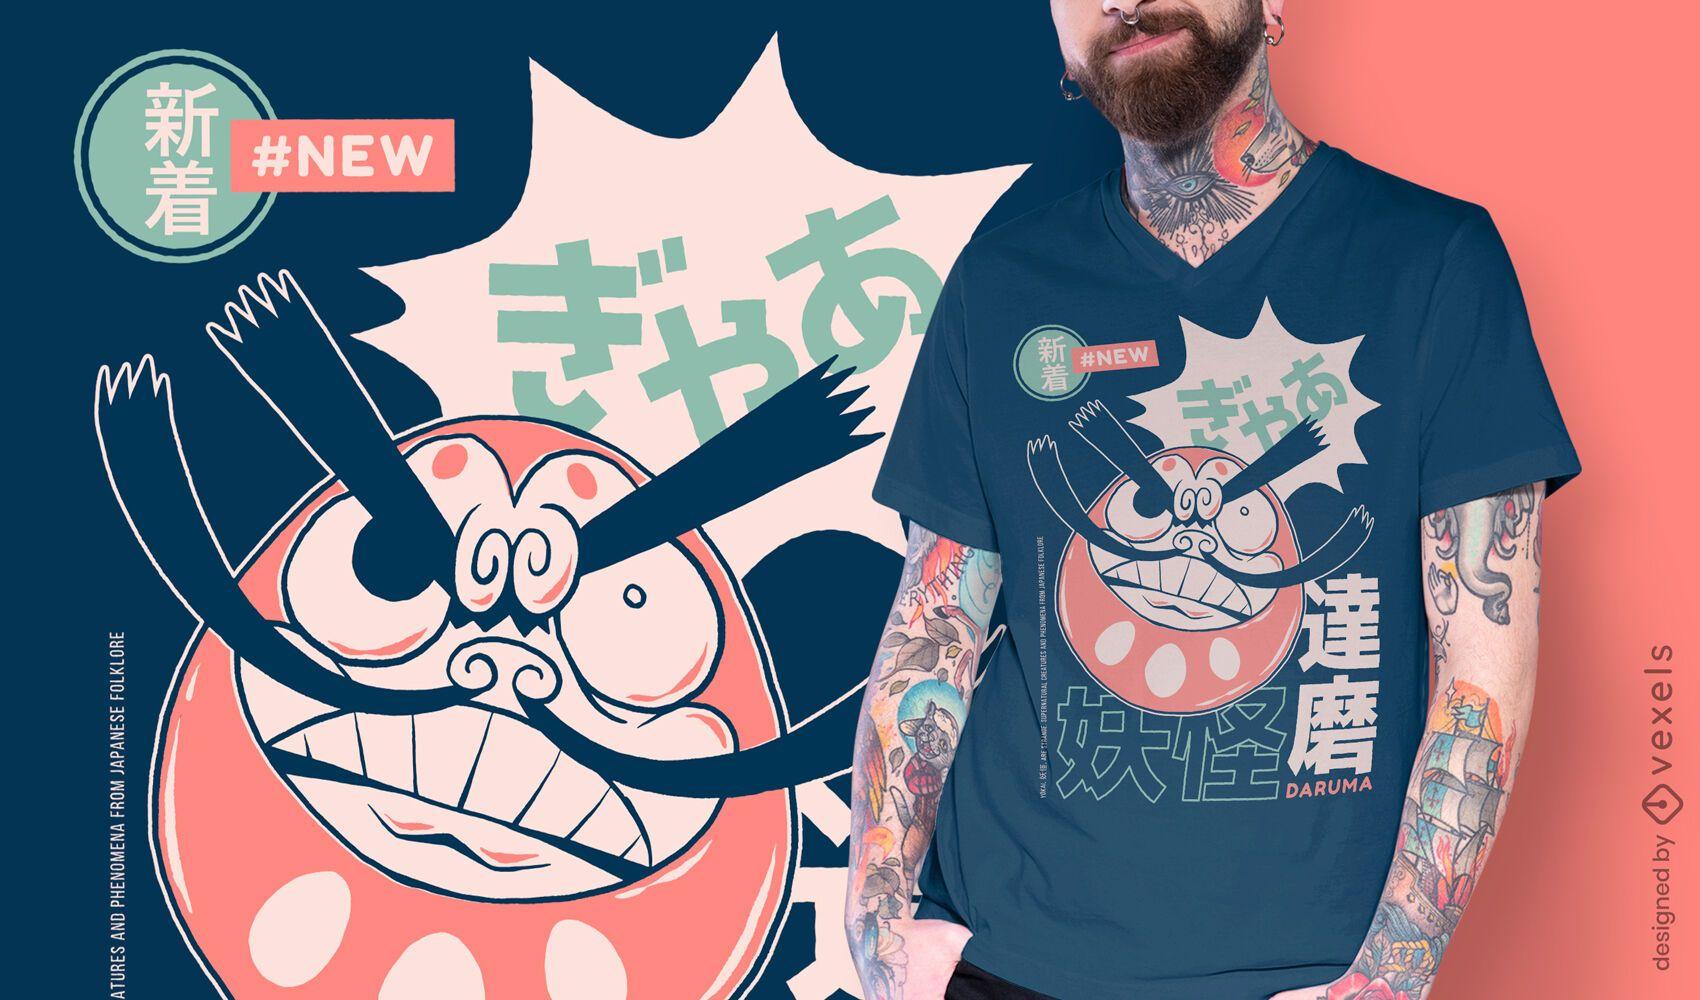 Design de t-shirt japonesa yokai Daruma